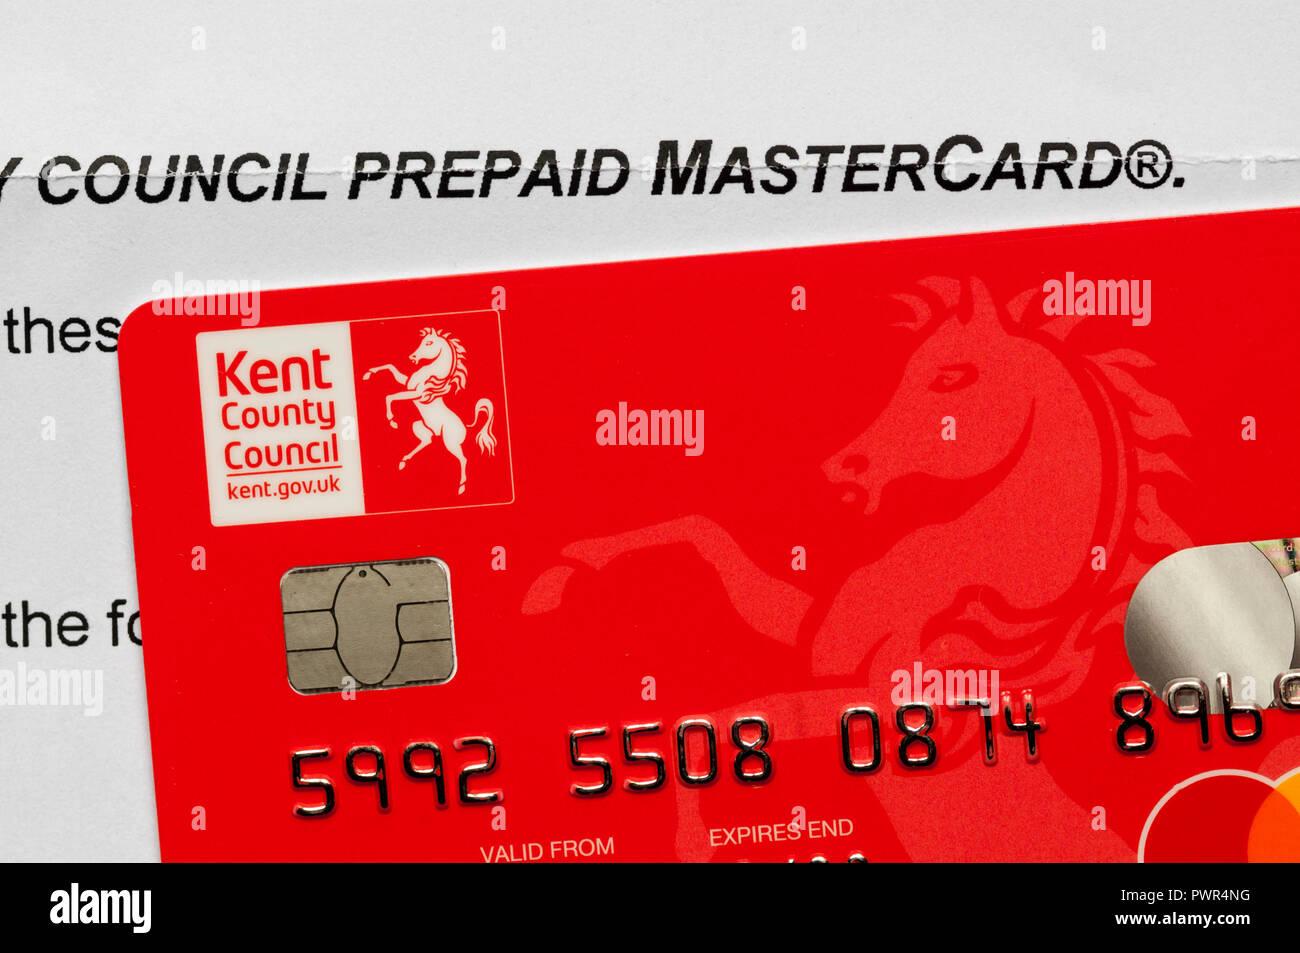 Prepaid Mastercard Stock Photos & Prepaid Mastercard Stock